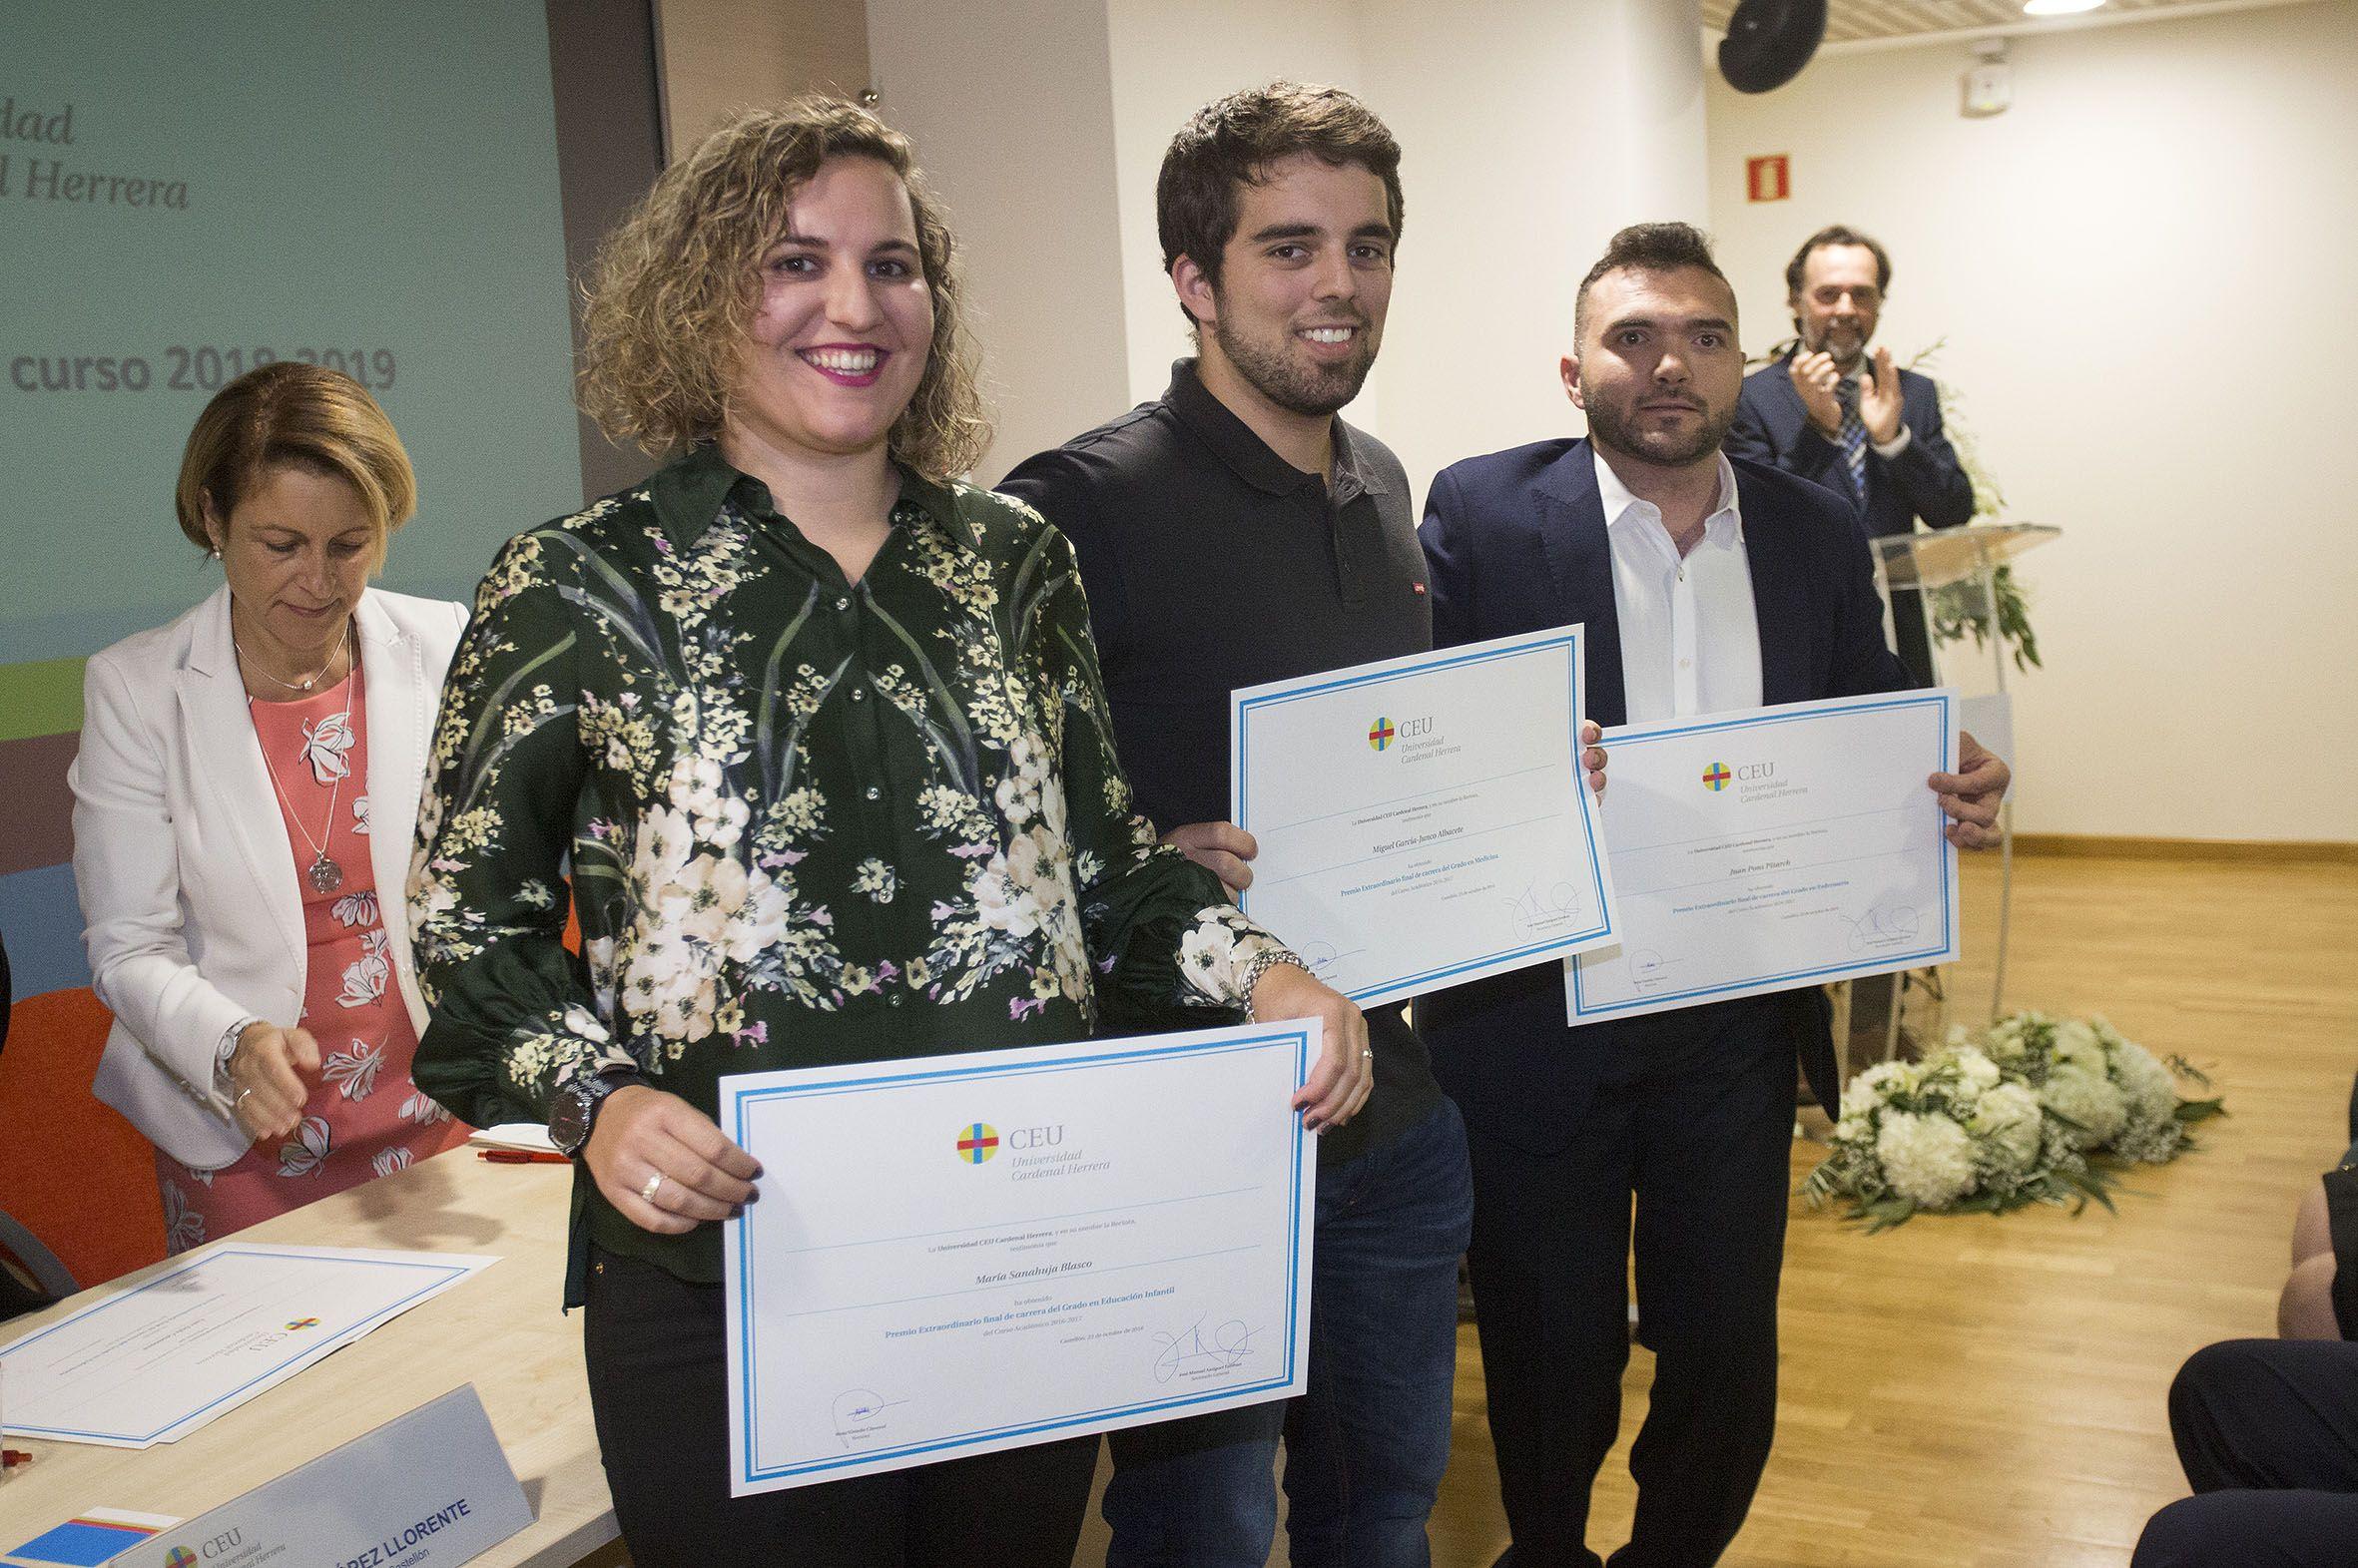 Castellon 23/10/2018 Acto de apertura de curso. Universidad Cardenal Herrera CEU Castellón Fotos Angel Sanchez/ACF Fotografia